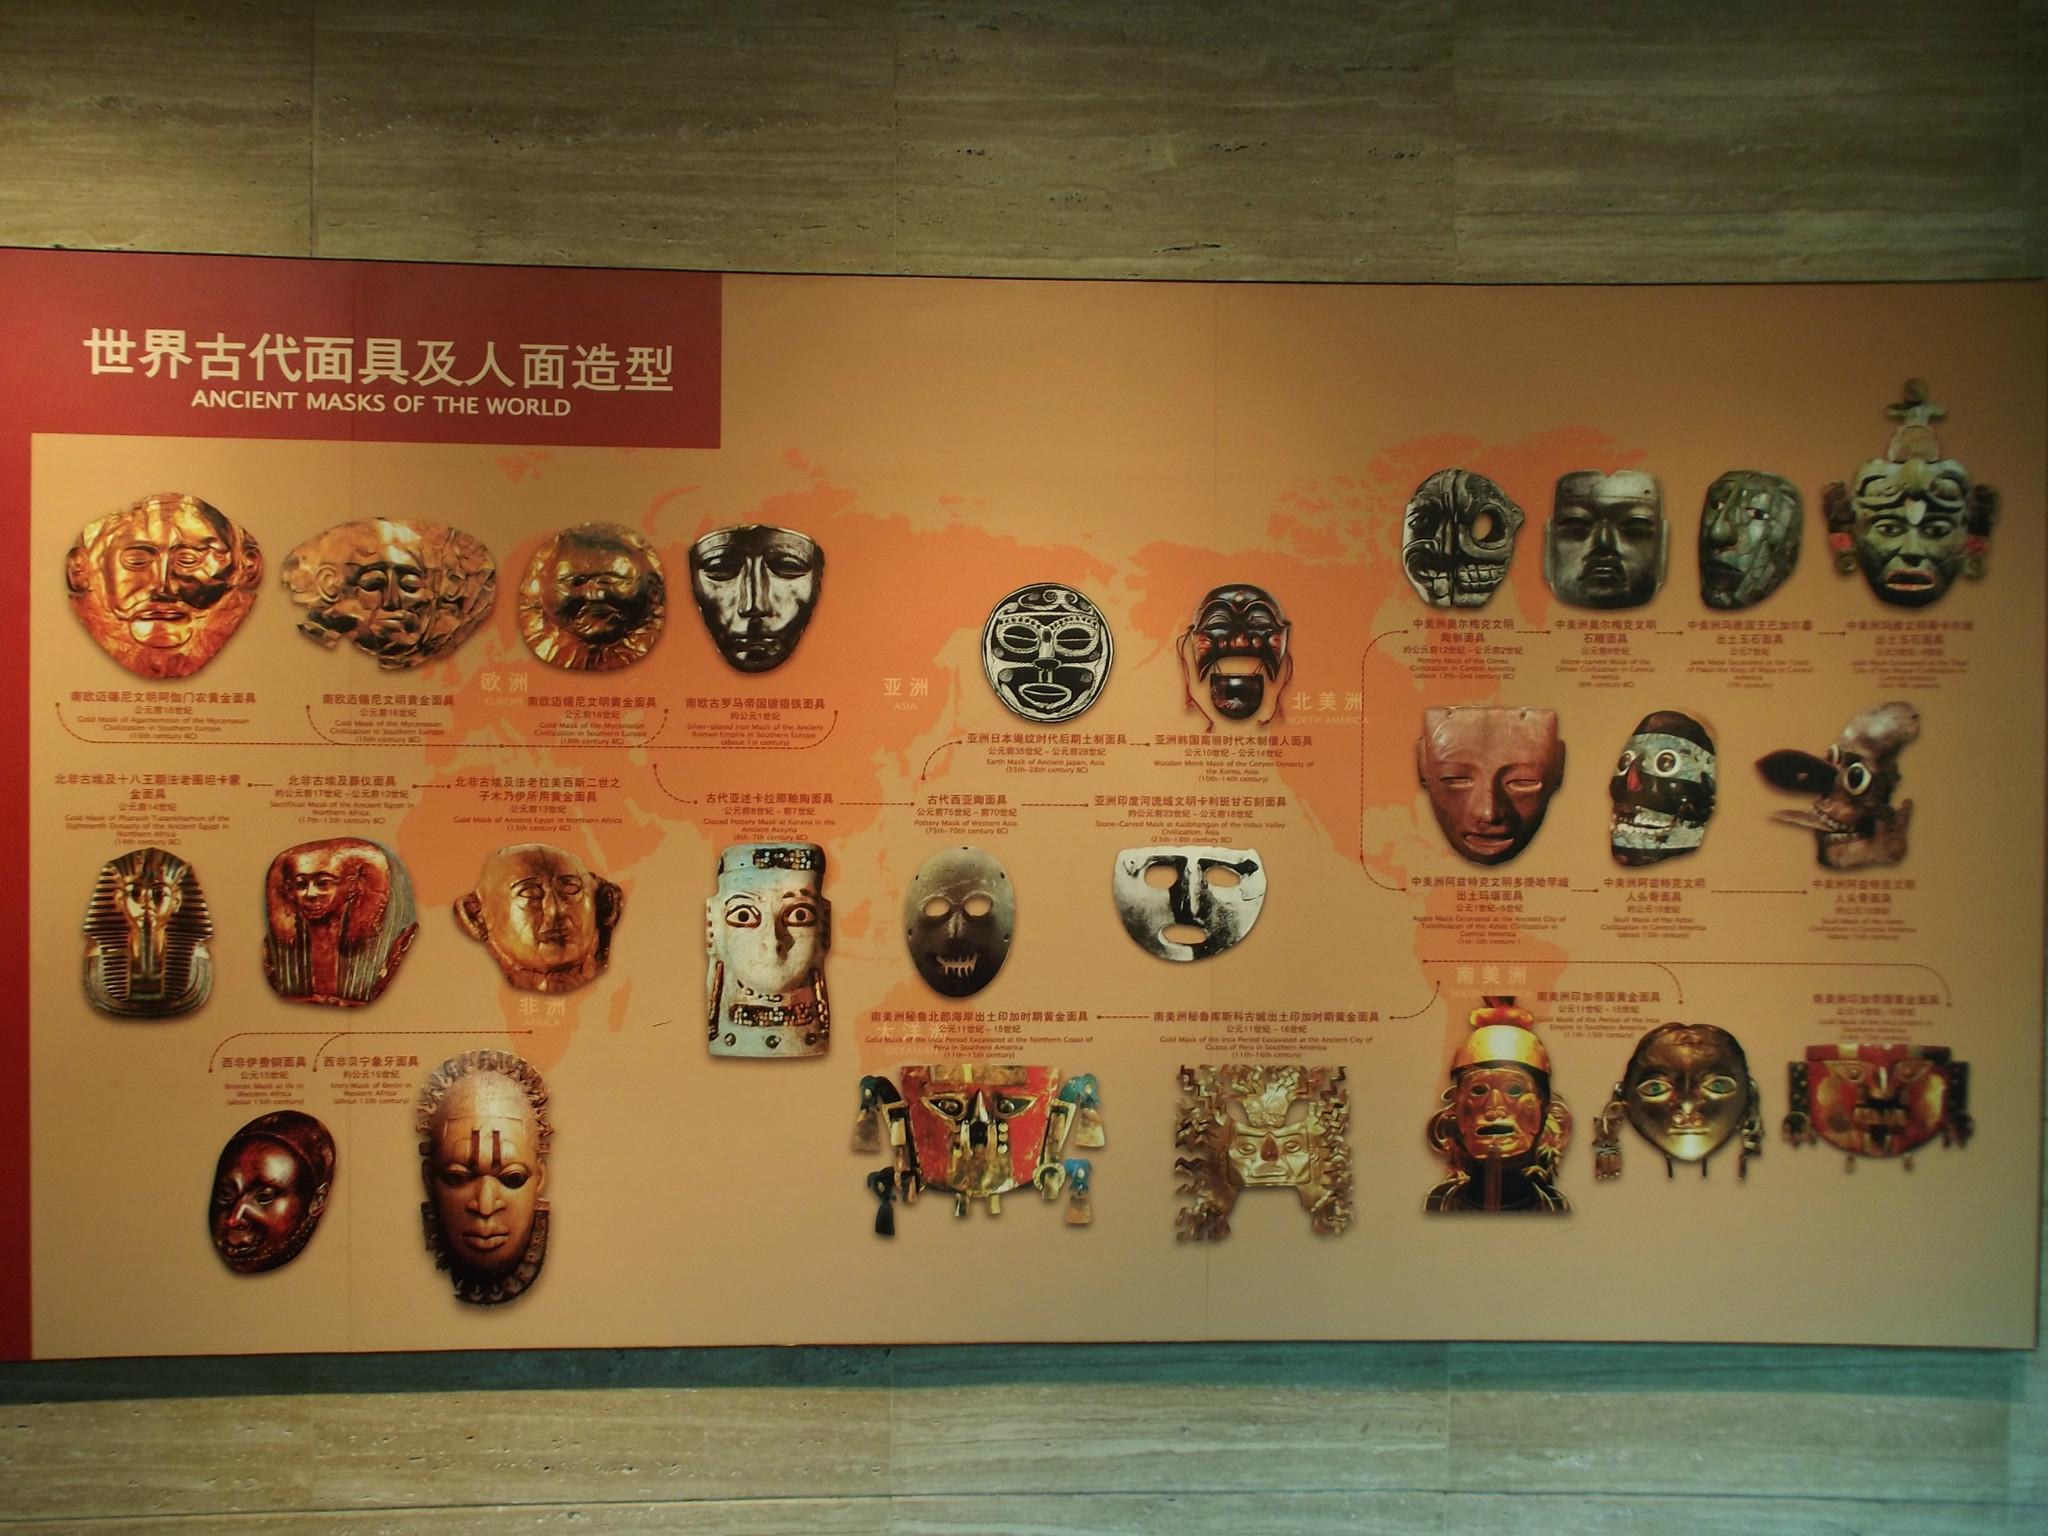 SiChuan SanXingDui Museum